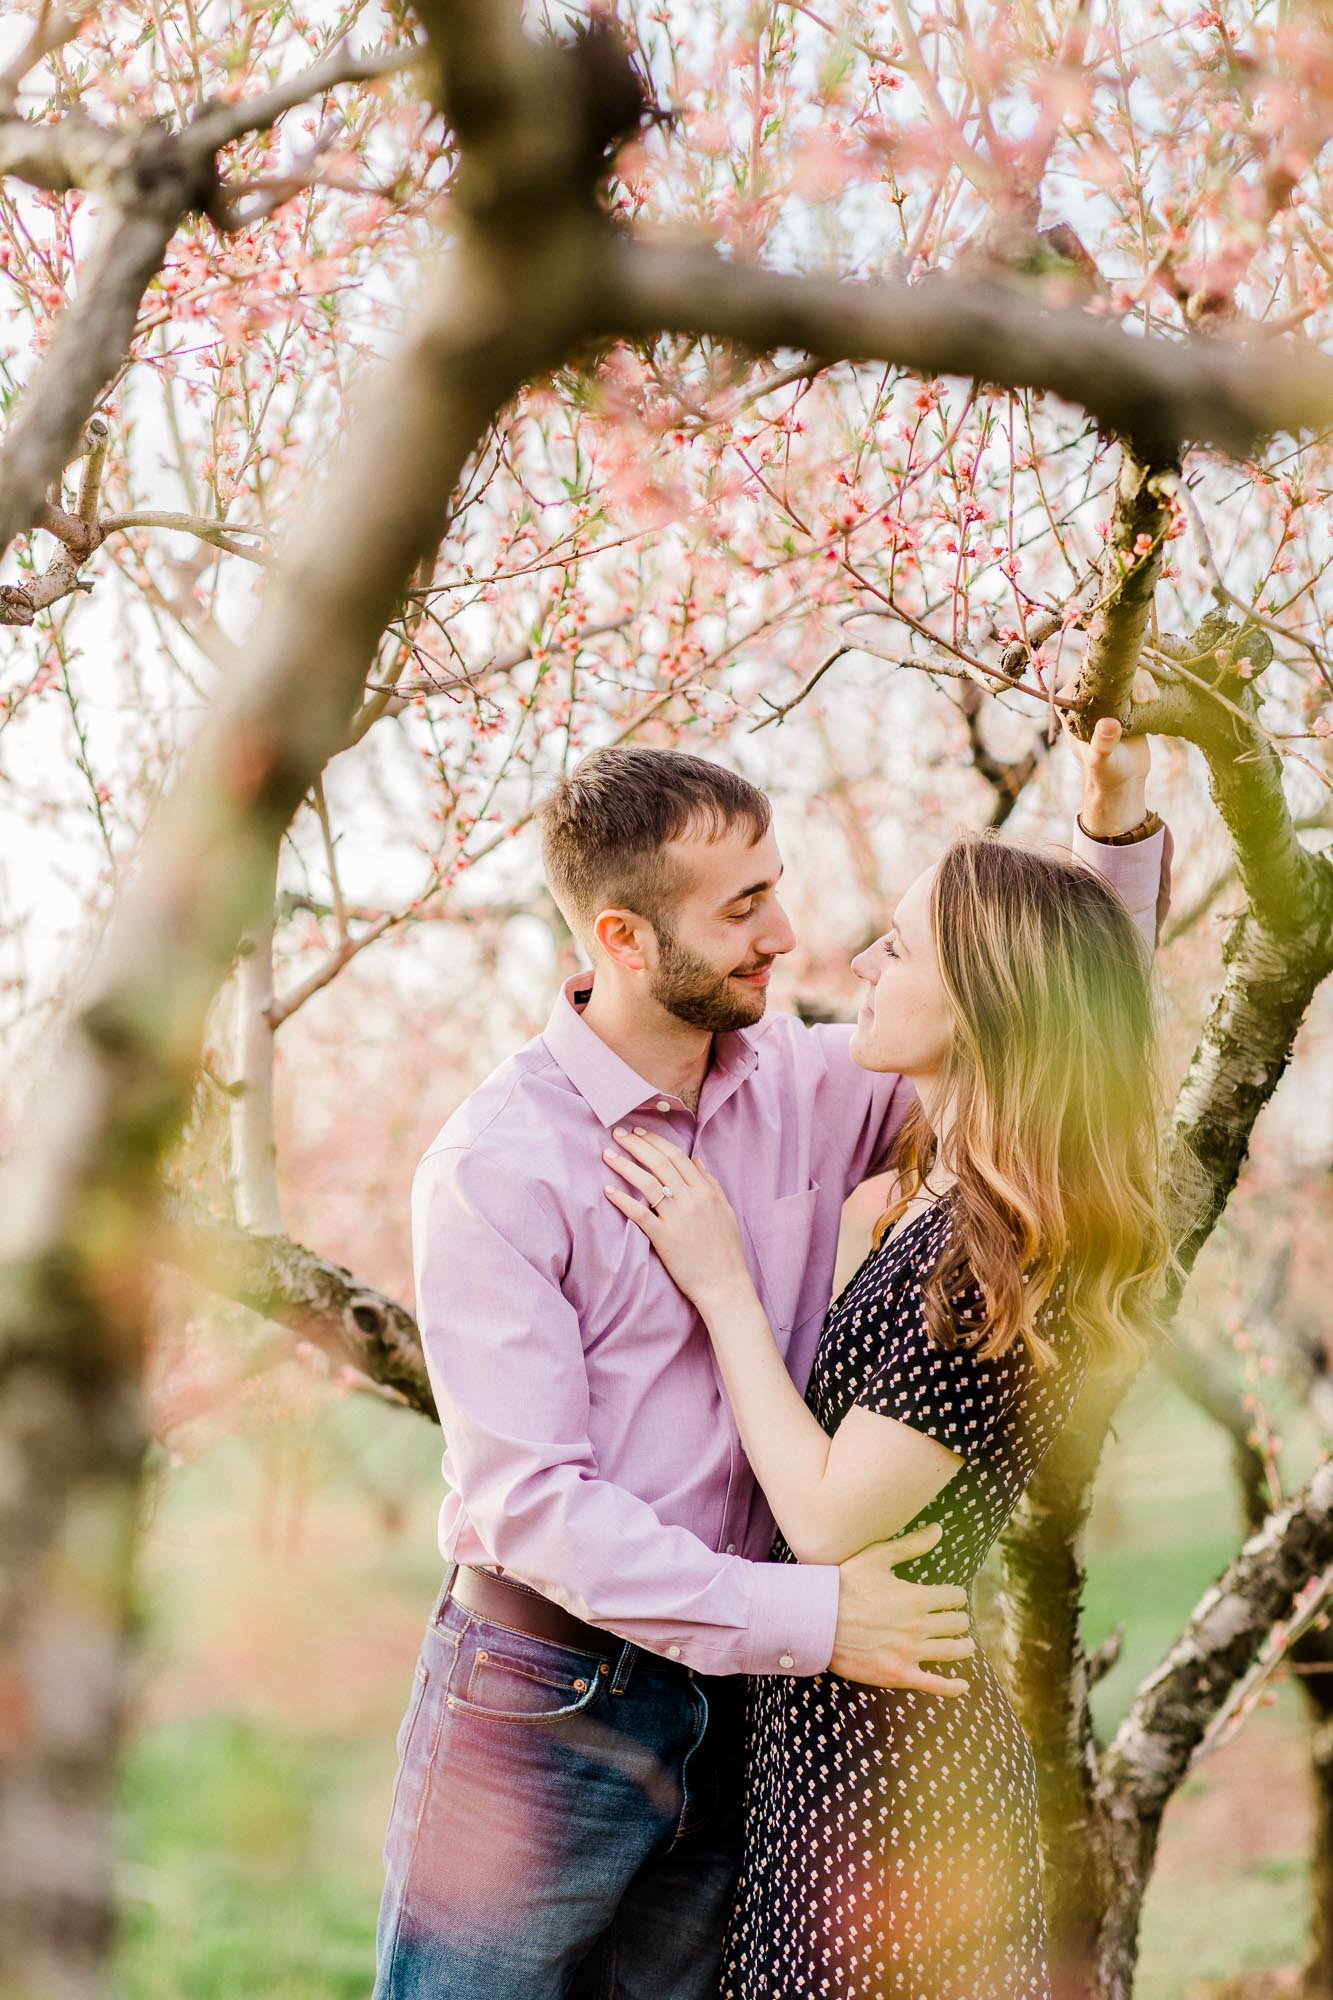 Rohrbachs-Spring-cherry-blossom-engagement-7614.jpg